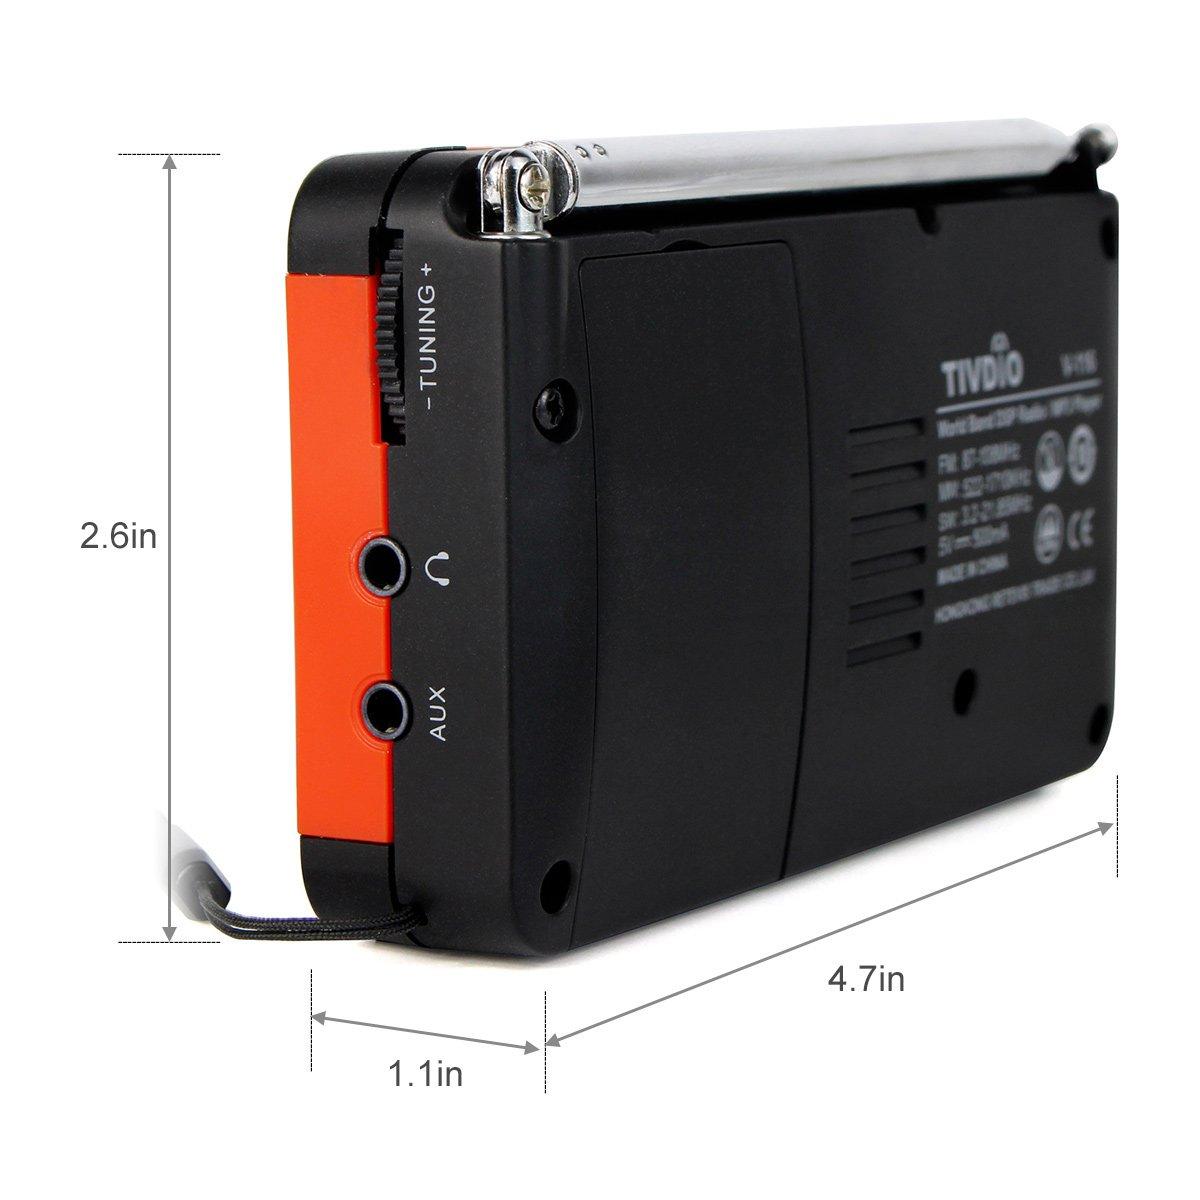 Tivdio V 116 Portable Shortwave Radio With Am Fm 25 Metres Range Short Wave Transmitter Transistor Support Micro Sd Card Aux Input Mp3 Player Speaker Alarm Clock Sleep Timerblack And